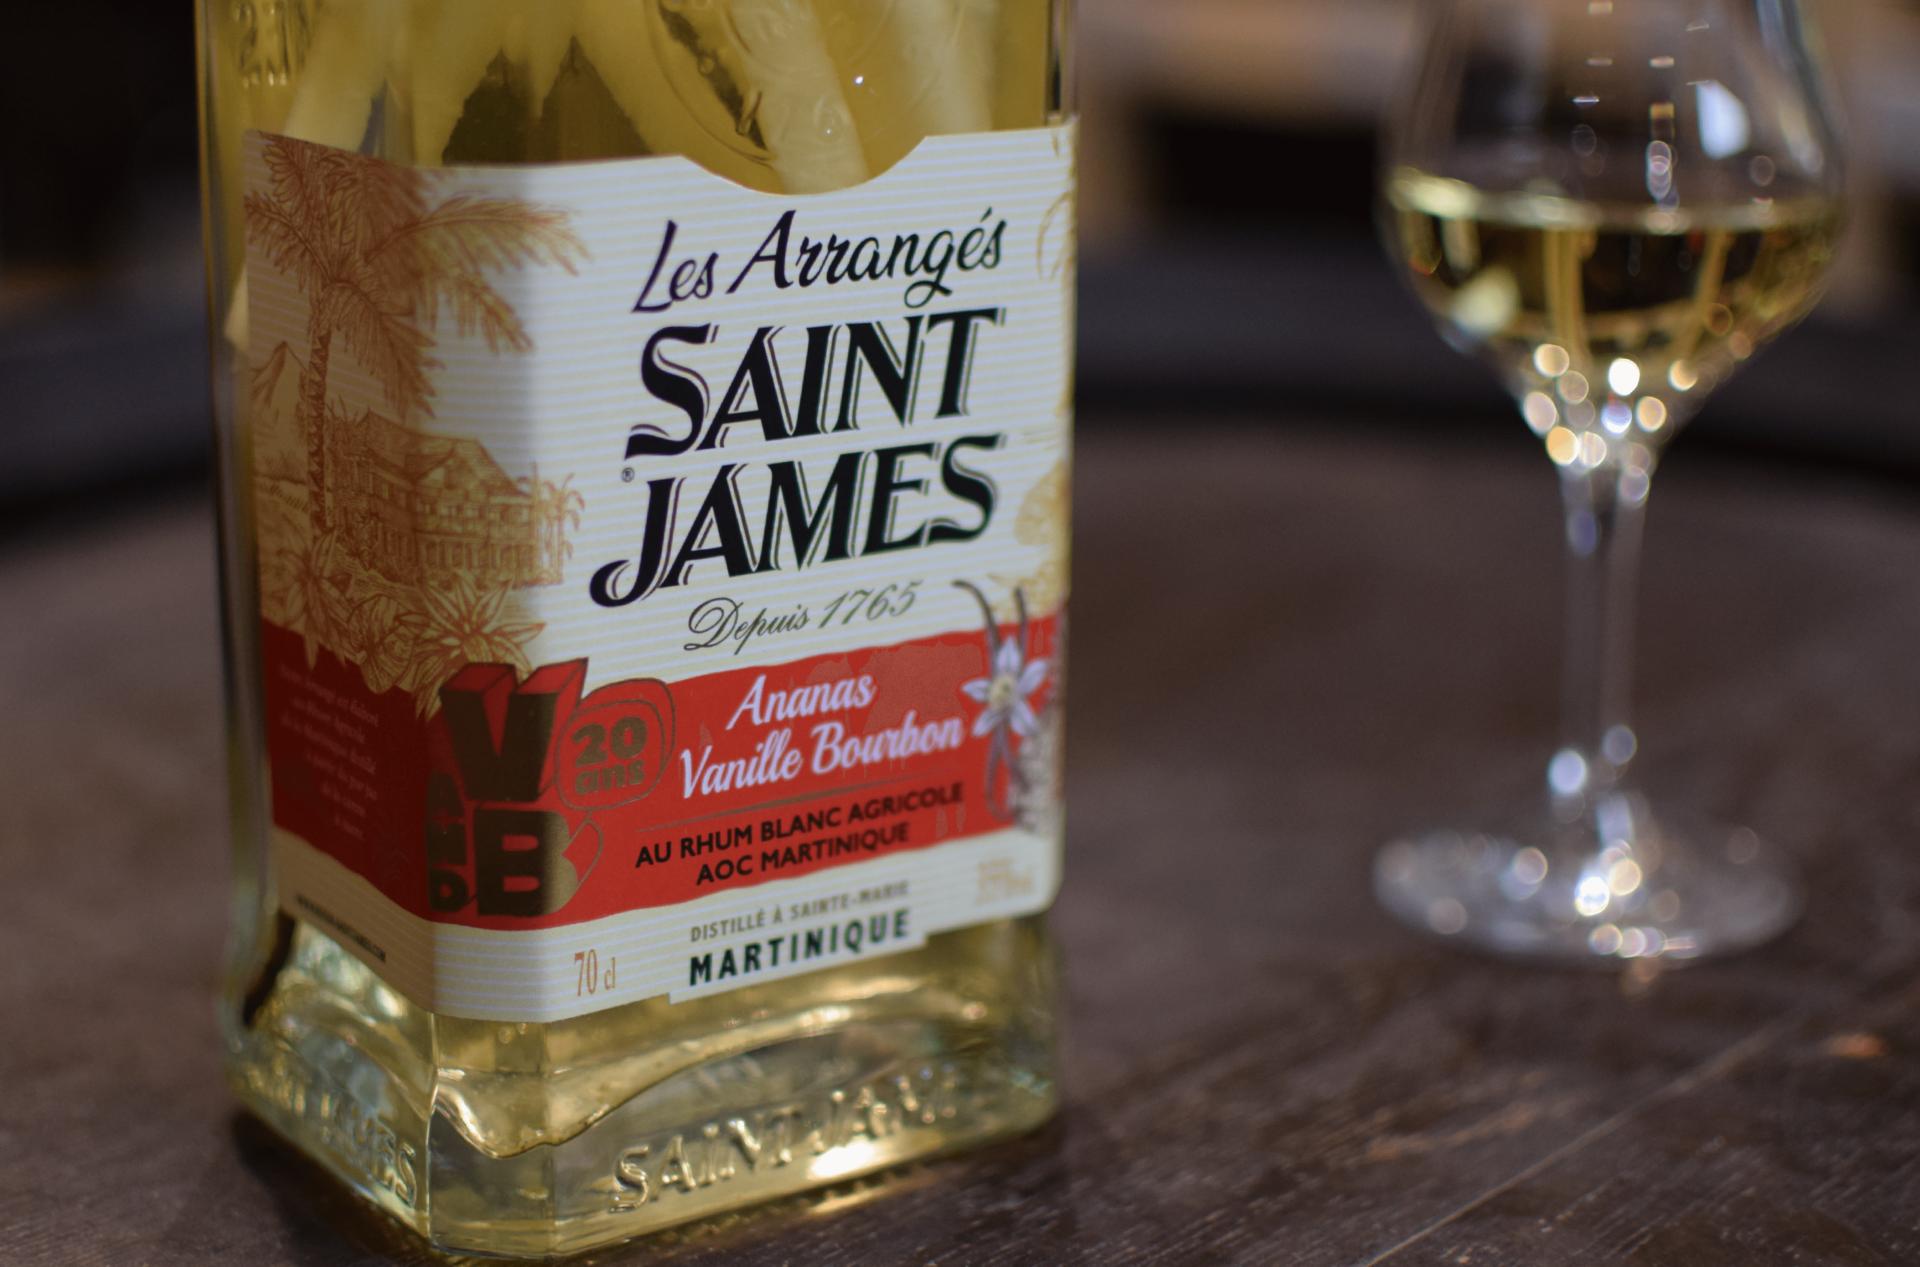 Saint James arrangé ananas vanille Bourbon 20 ans V and B 35%